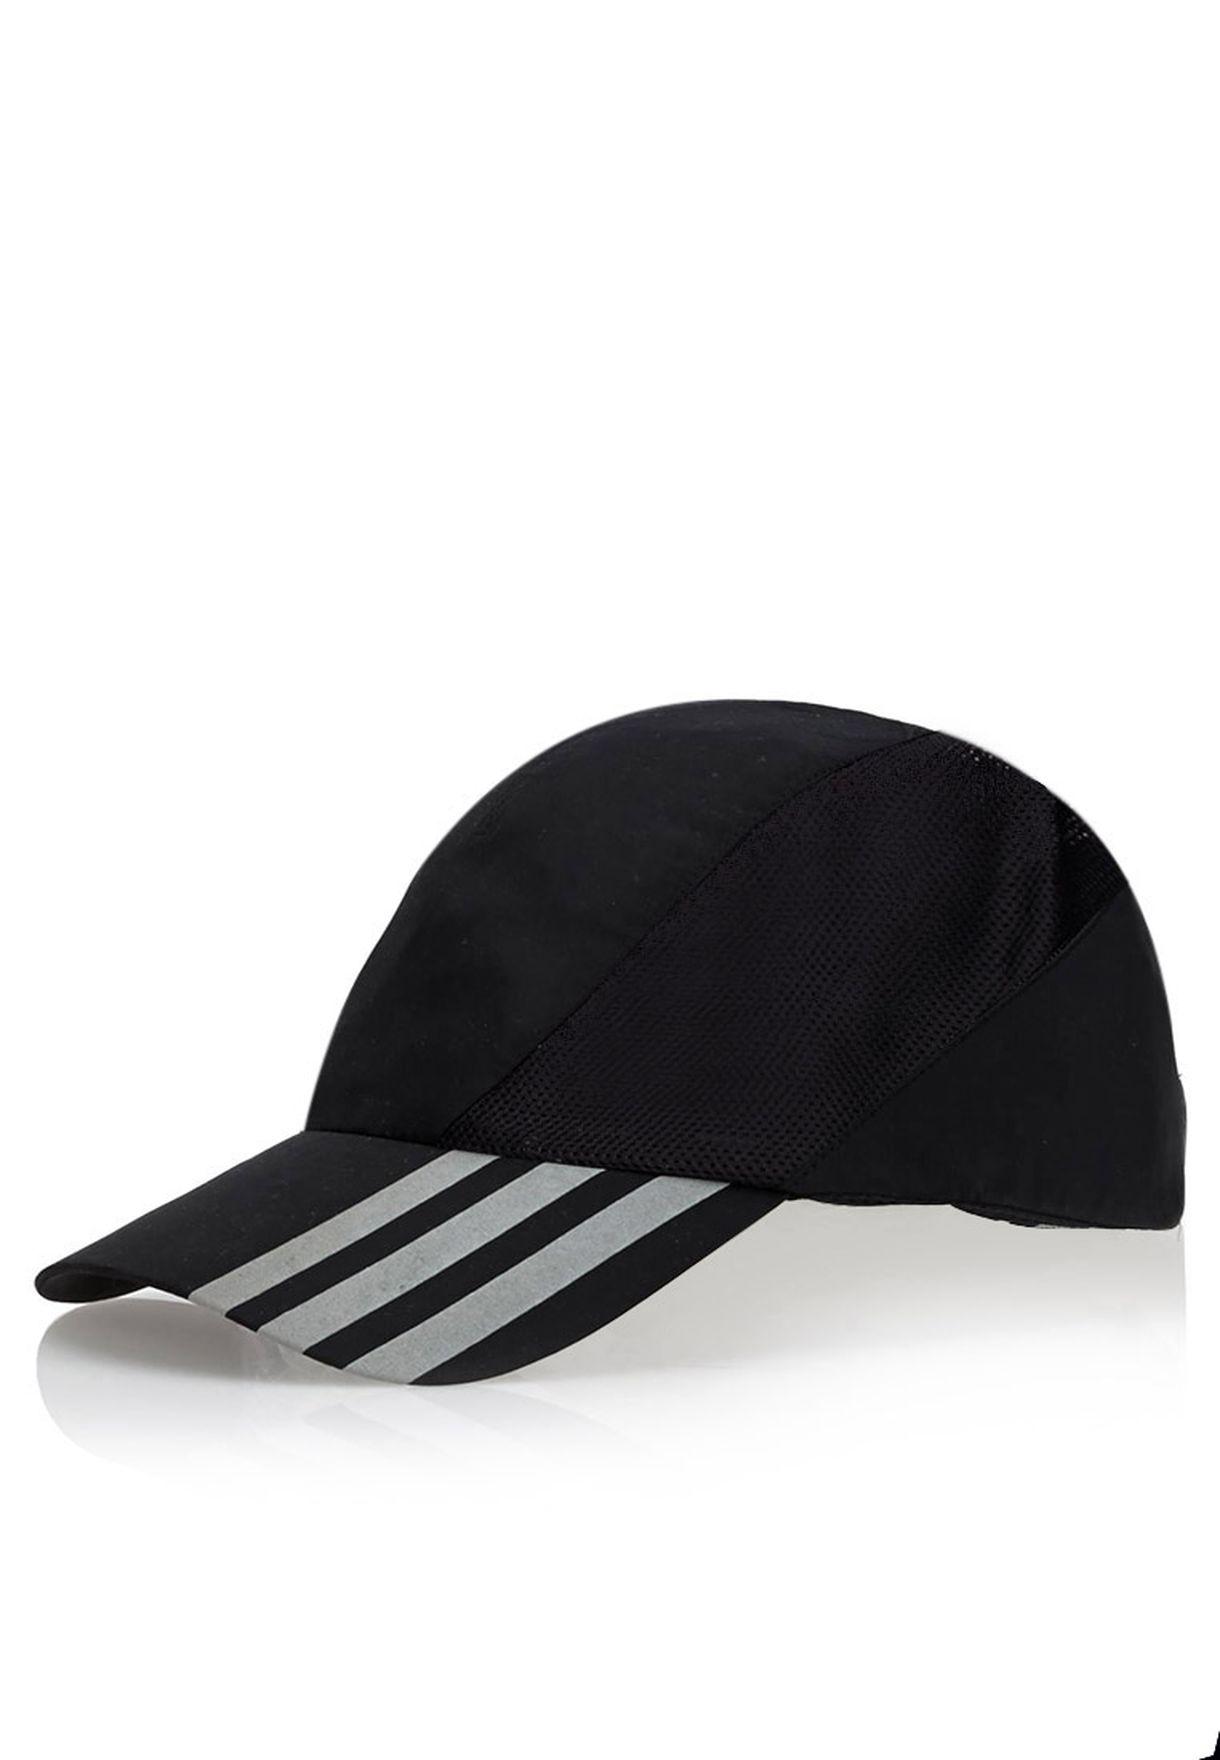 c8045ff86ae Shop adidas black Run 3S Cap M67558 for Men in UAE - AD476AC29RKO